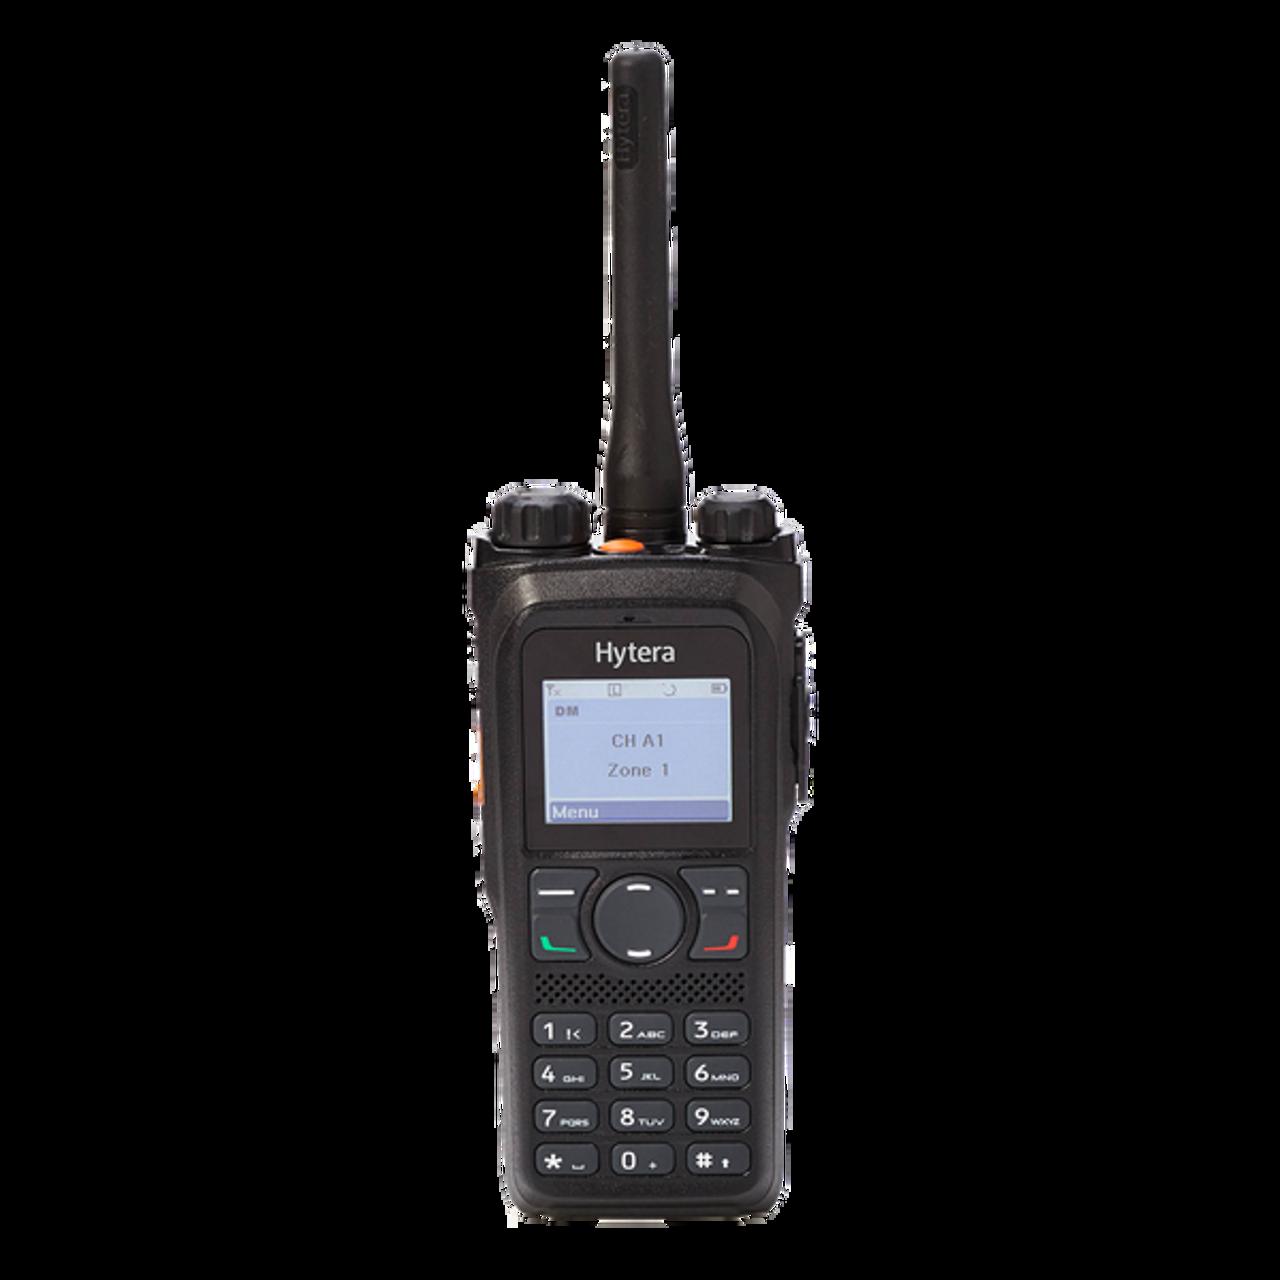 Hytera PD982i UL913 Intrinsically Safe Digital Two Way Radio